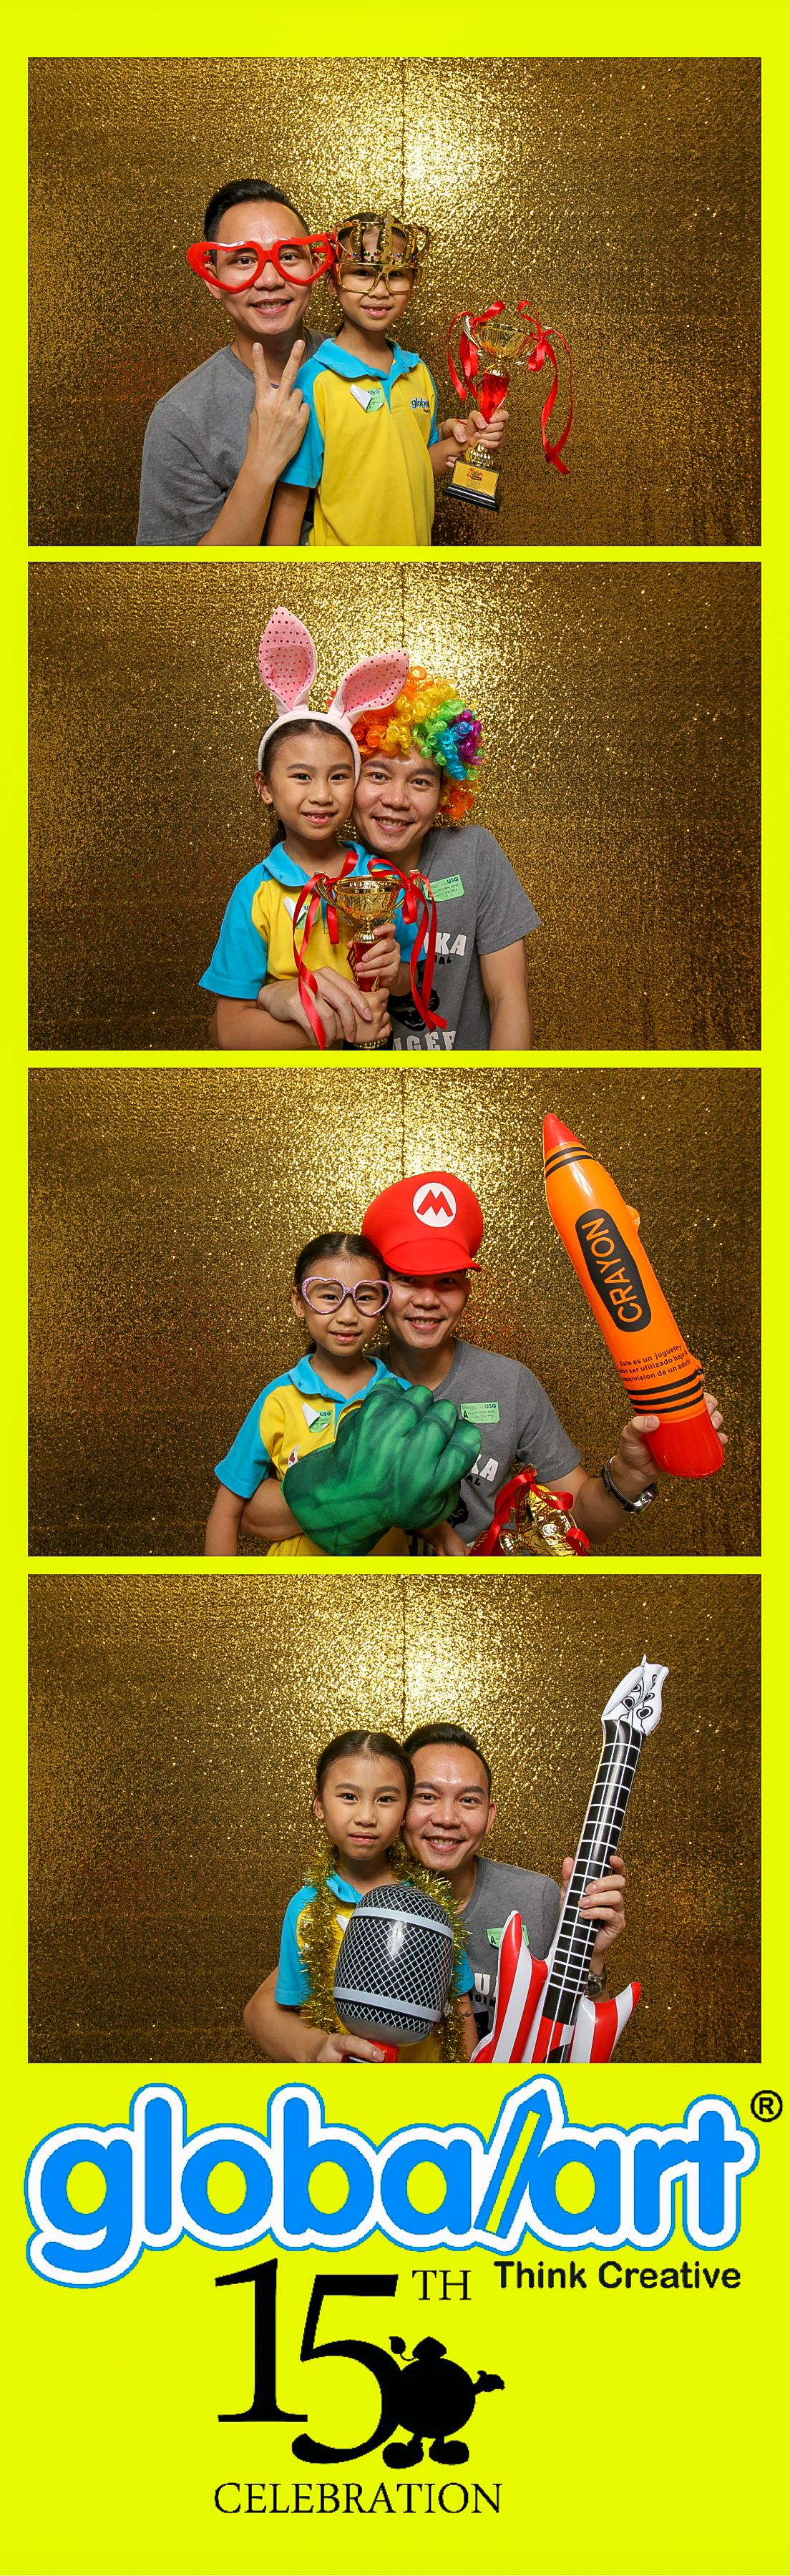 global art photo booth singapore (16)